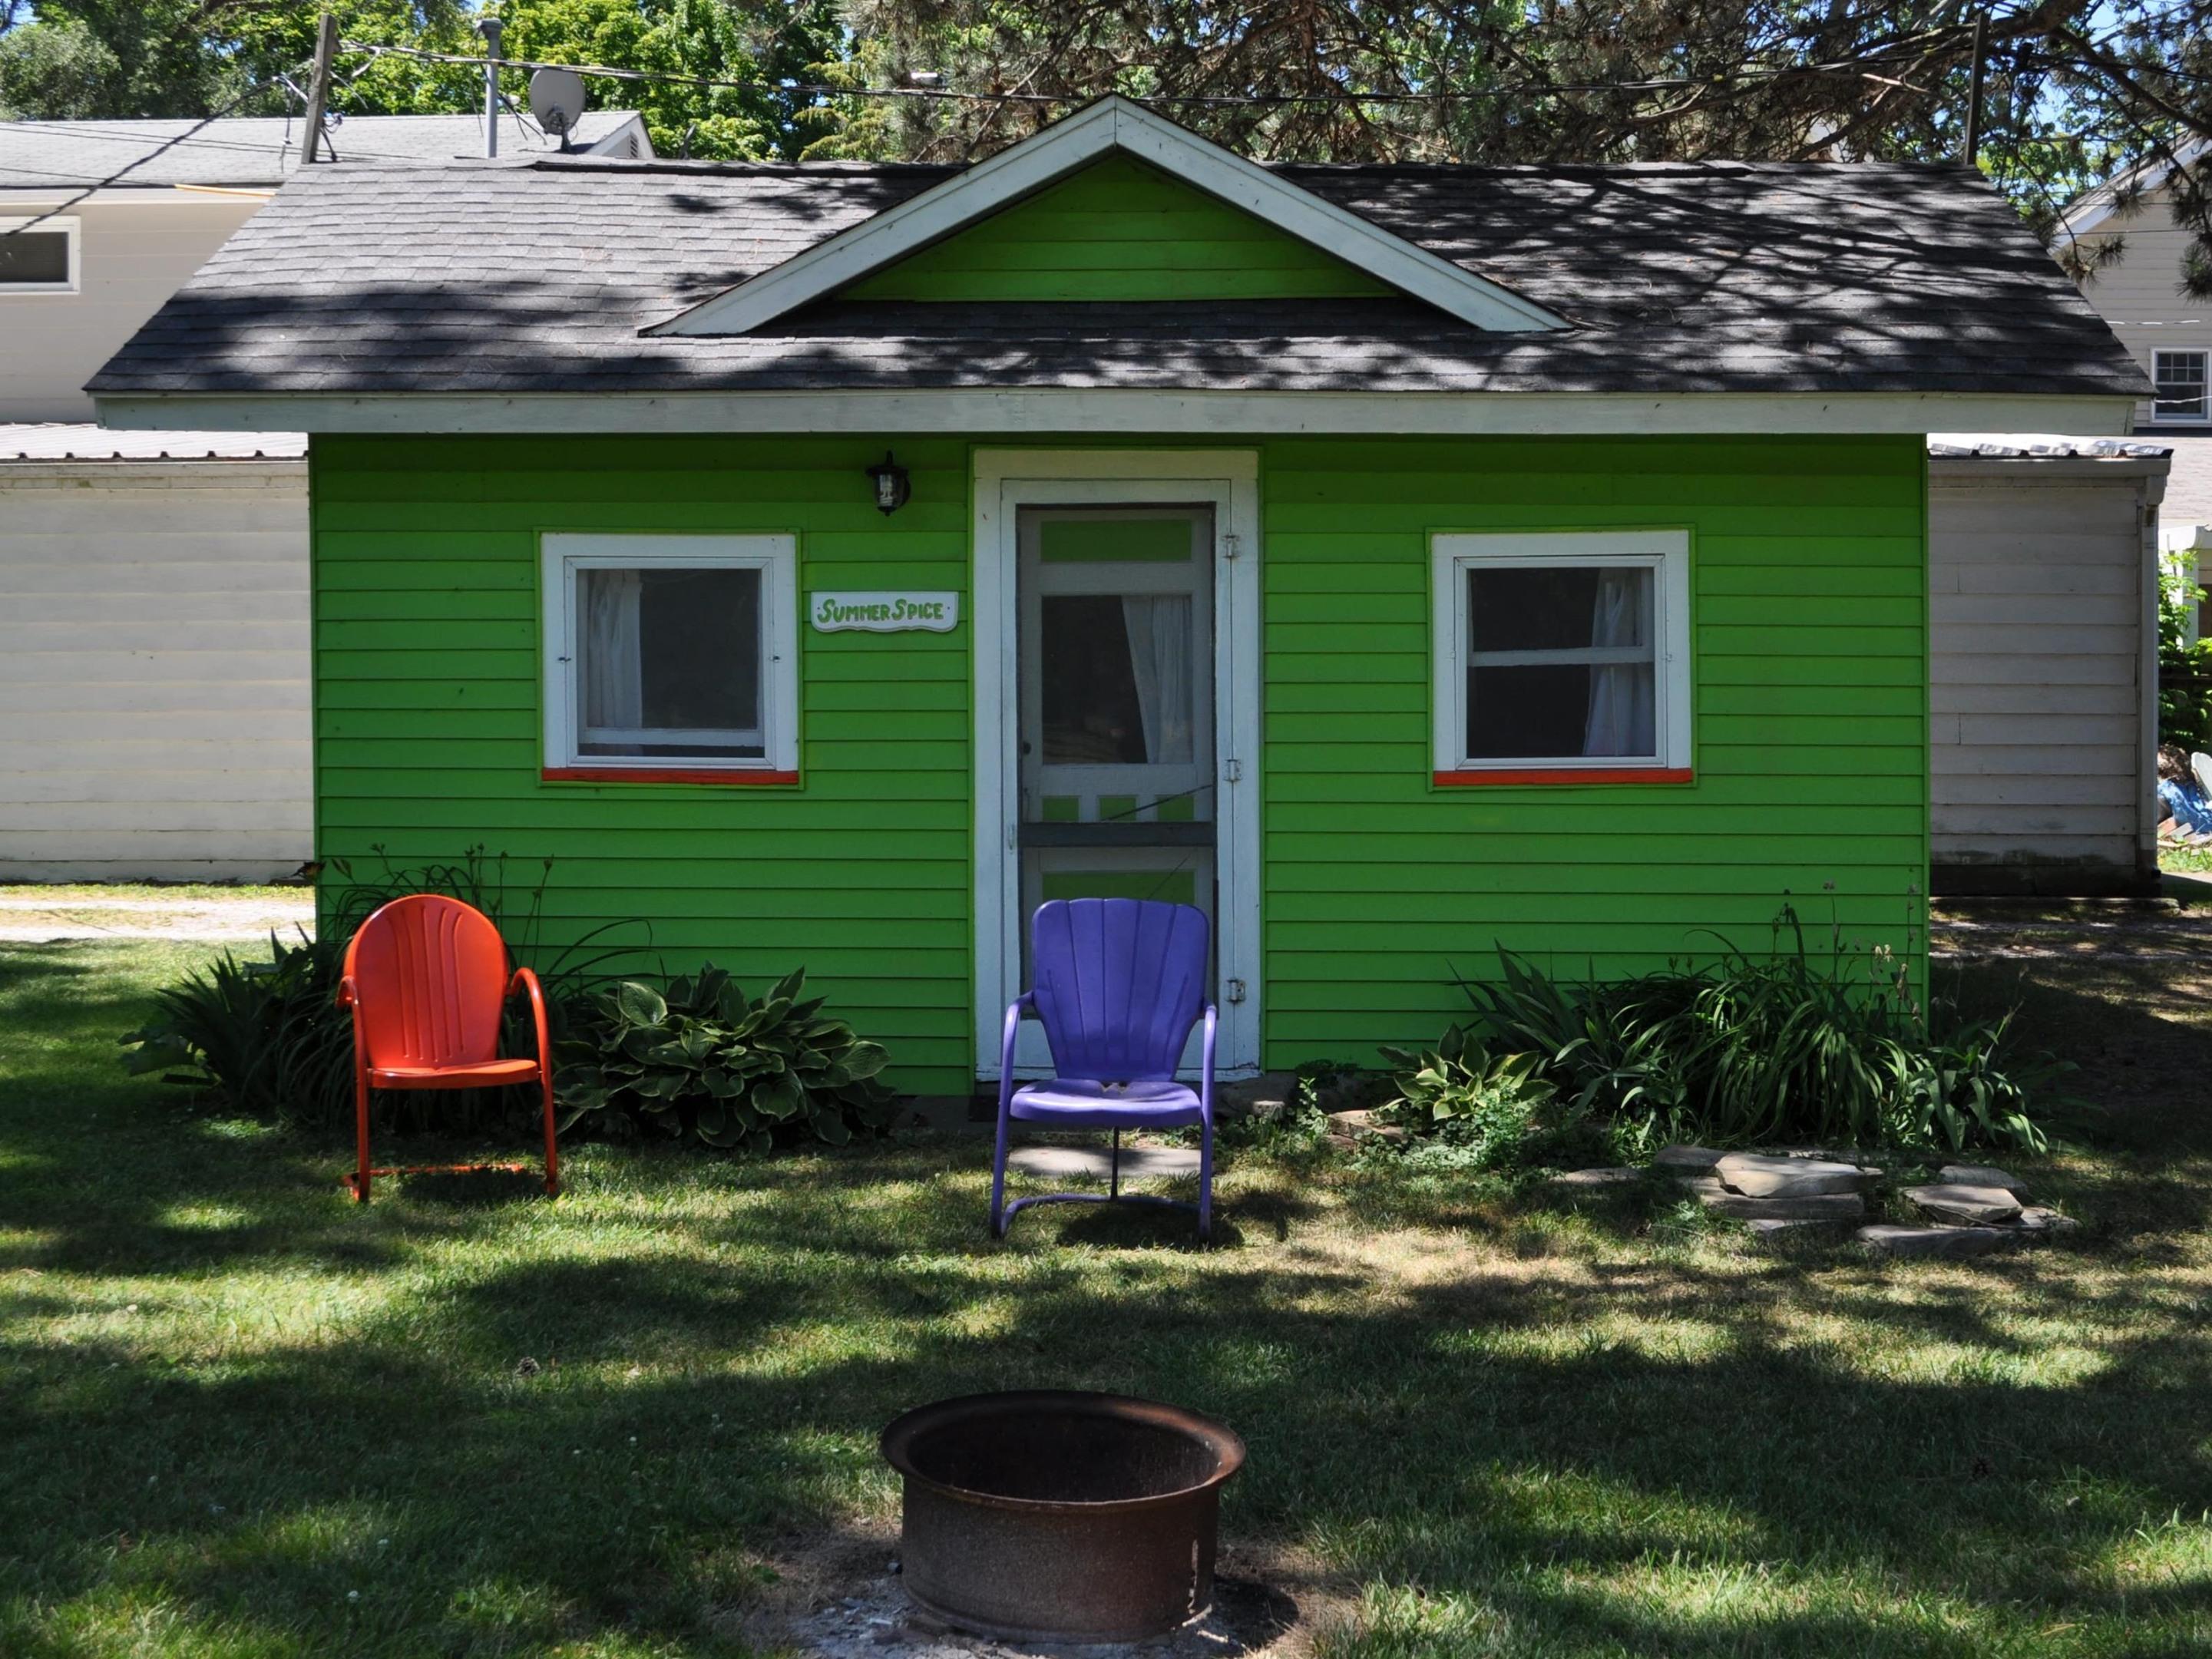 Summer Spice Cottage